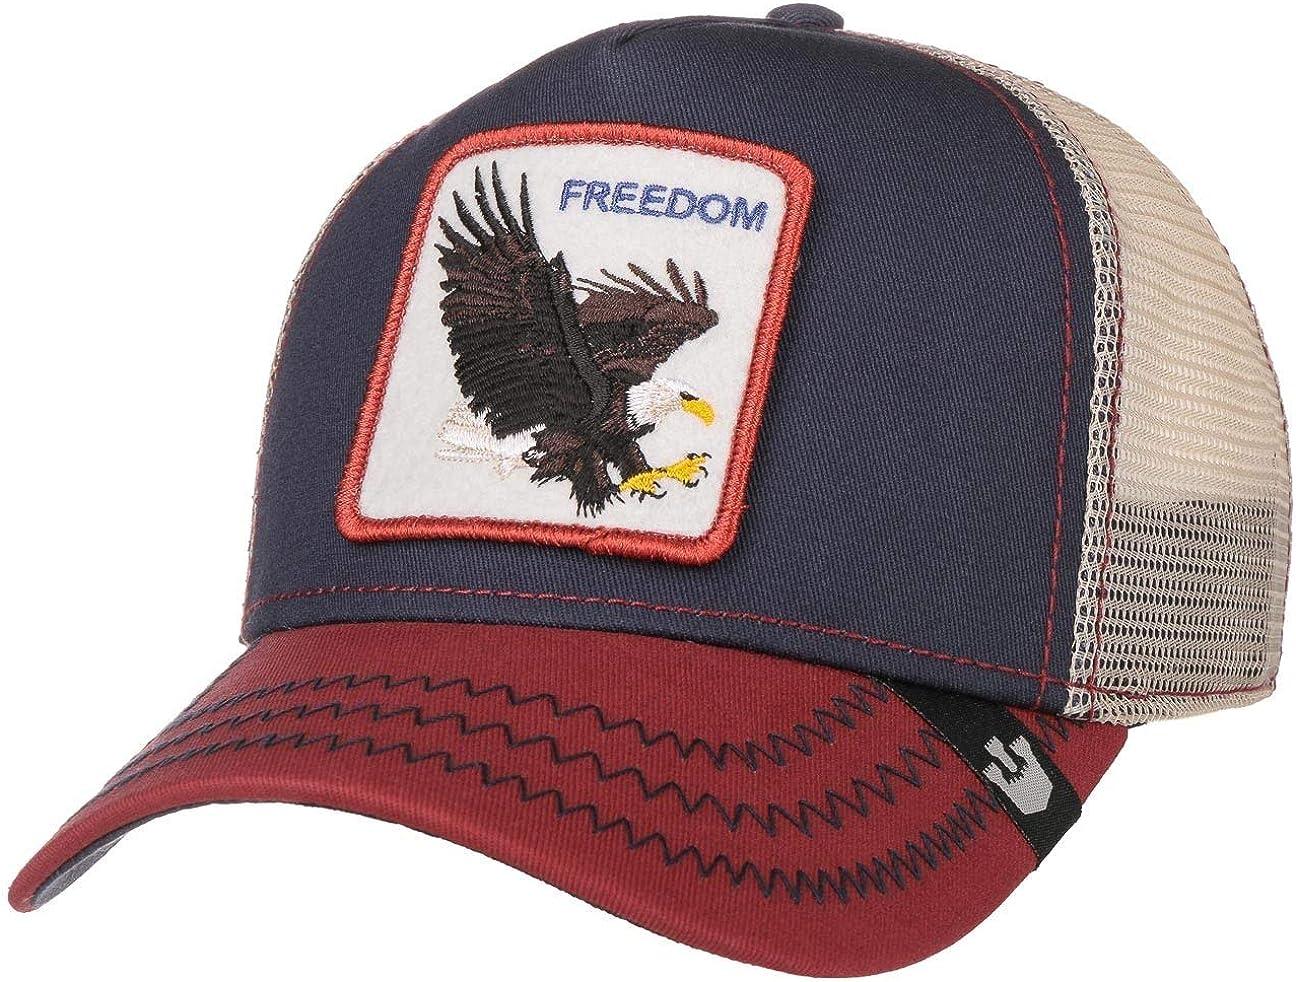 Goorin Bros. Gorra Trucker FreedomBros. de Malla Camionero (Talla ...